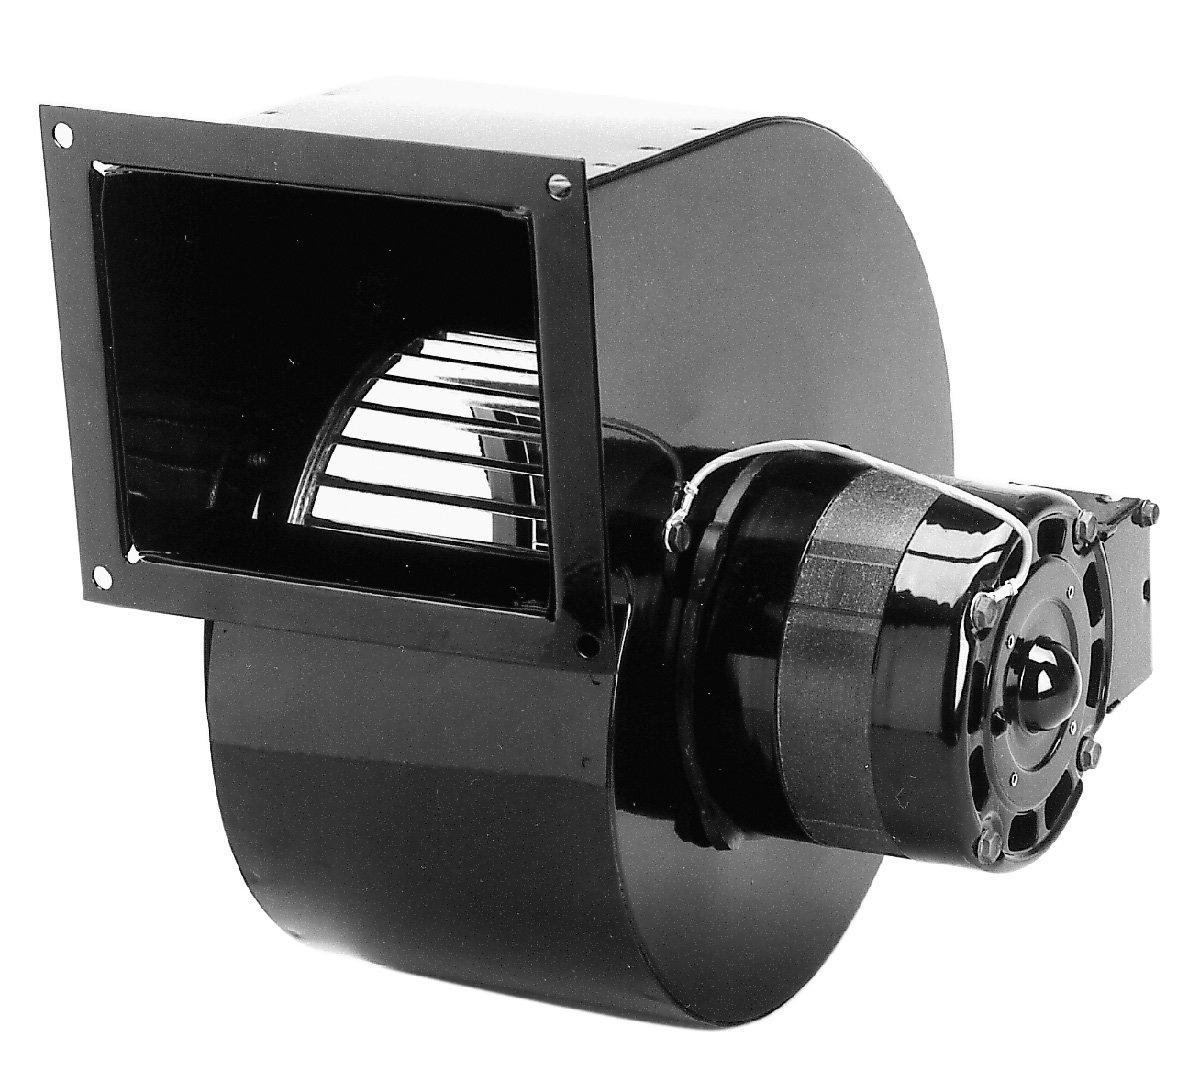 A.O. Smith 9465 495 CFM, 1/10 hp, 1570 RPM, 115 Volts, Shaded Pole, 1 Speed Centrifugal Blower by A. O. Smith B007ATNCI6